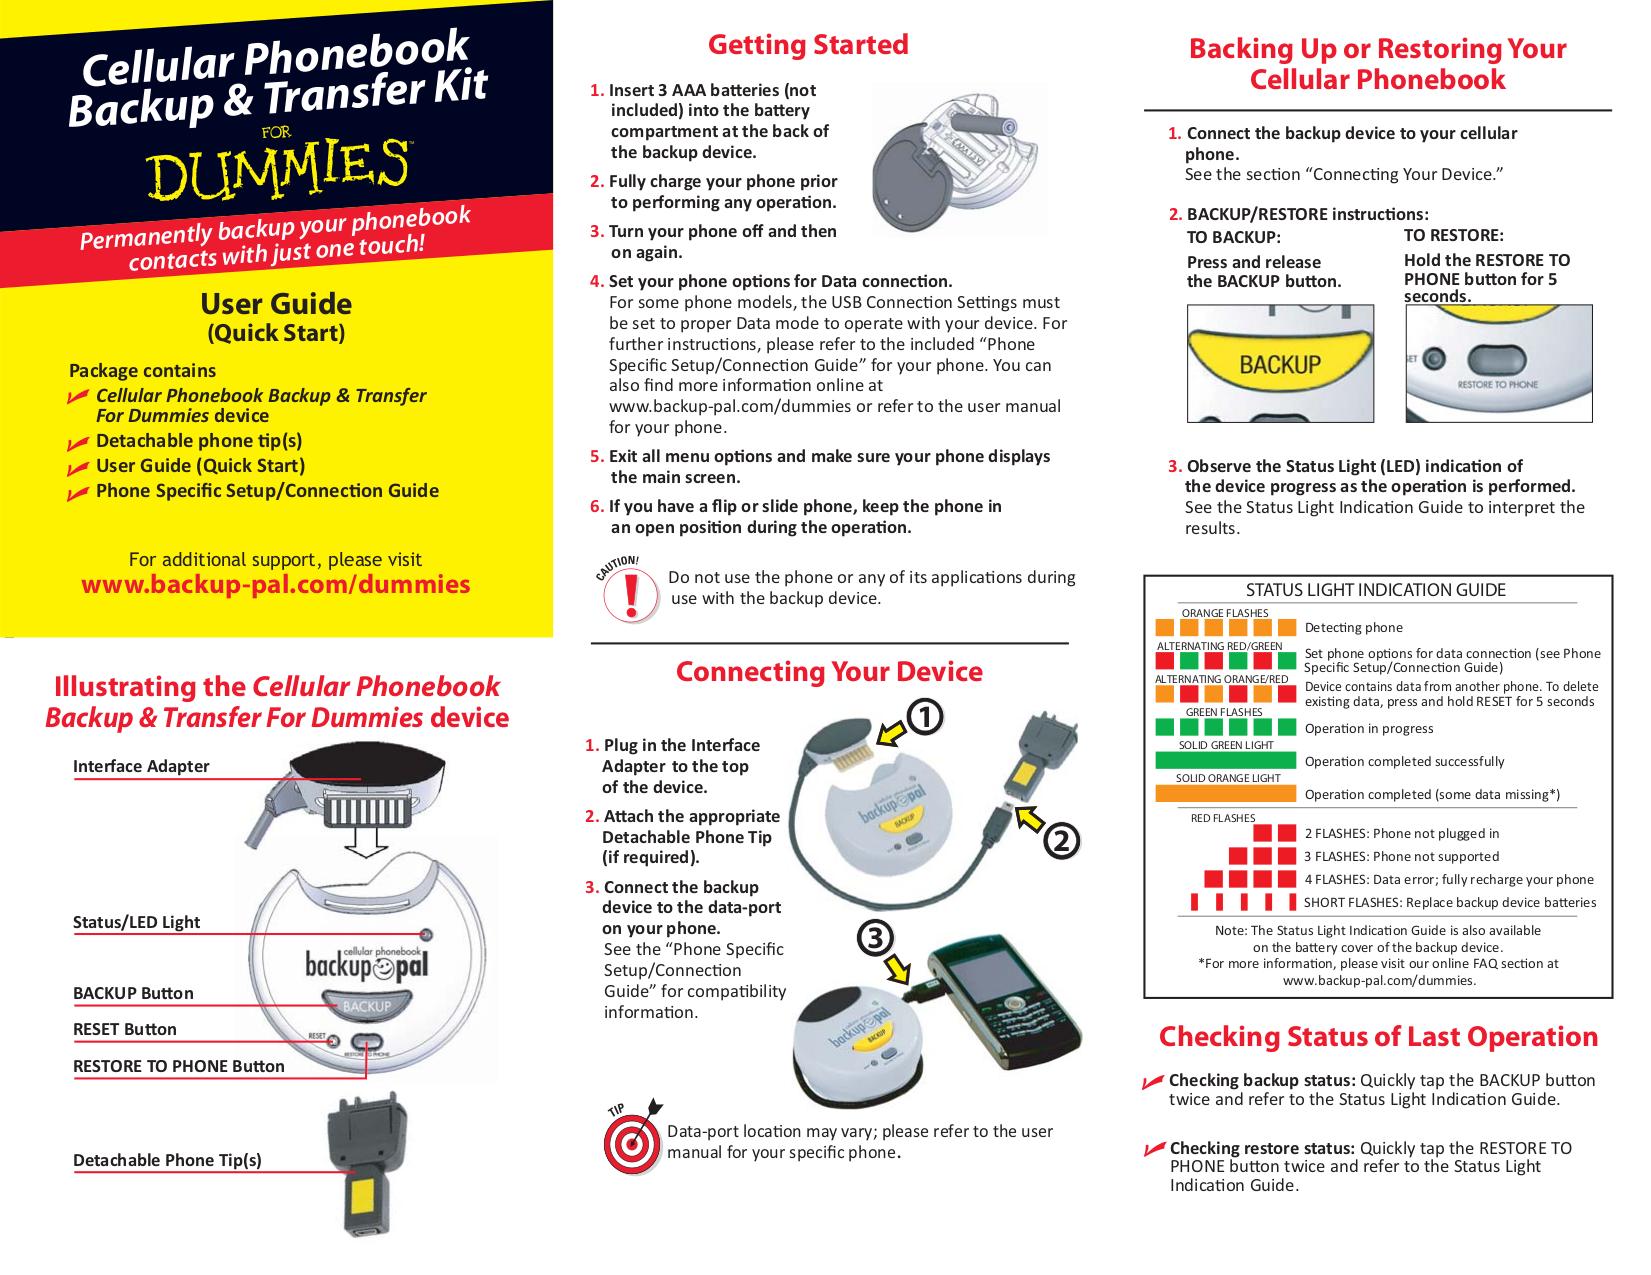 siebel administration guide 8.1 pdf